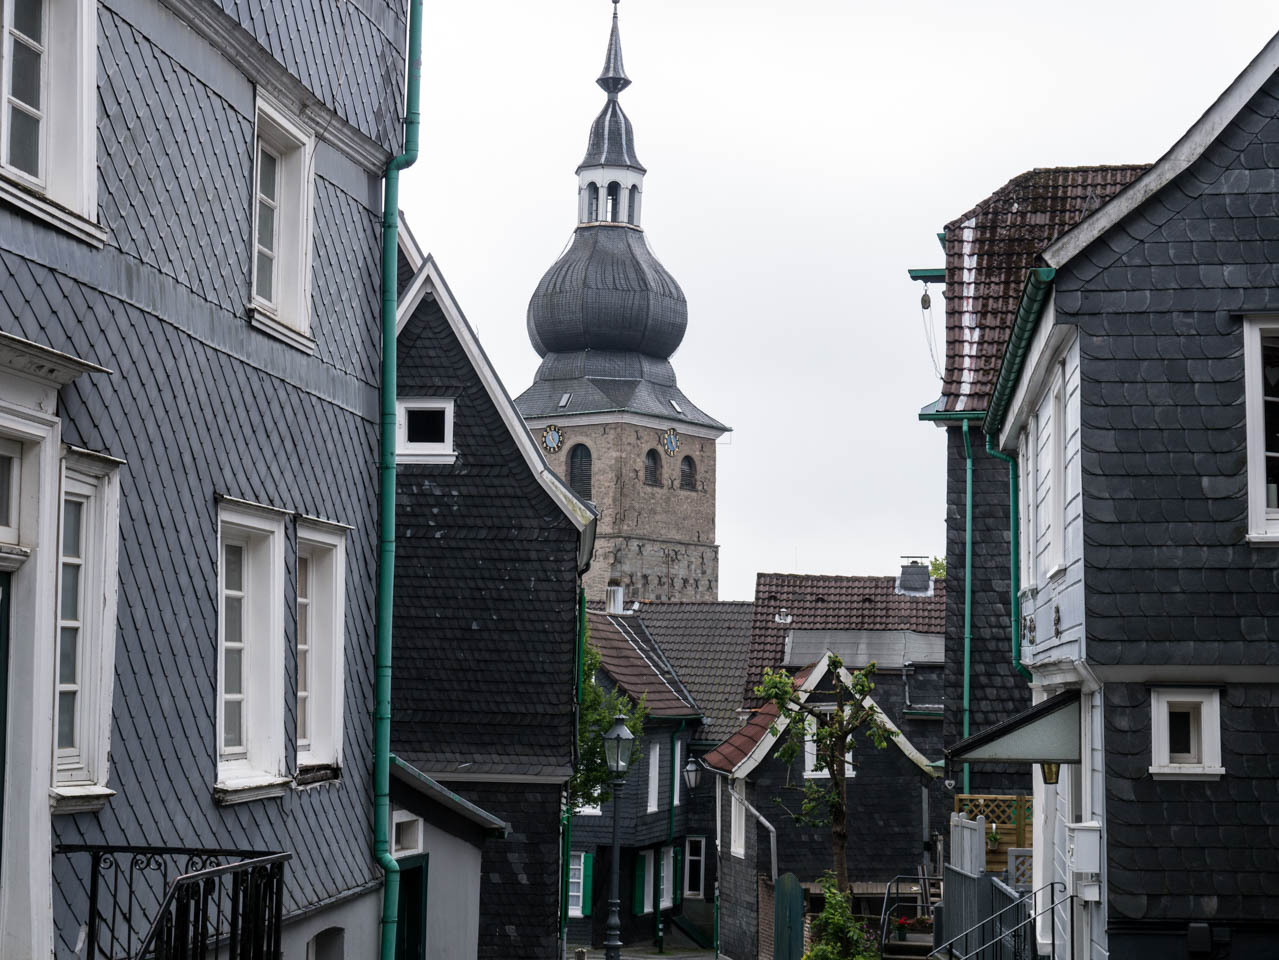 Kirche im Dorf (1 von 1)